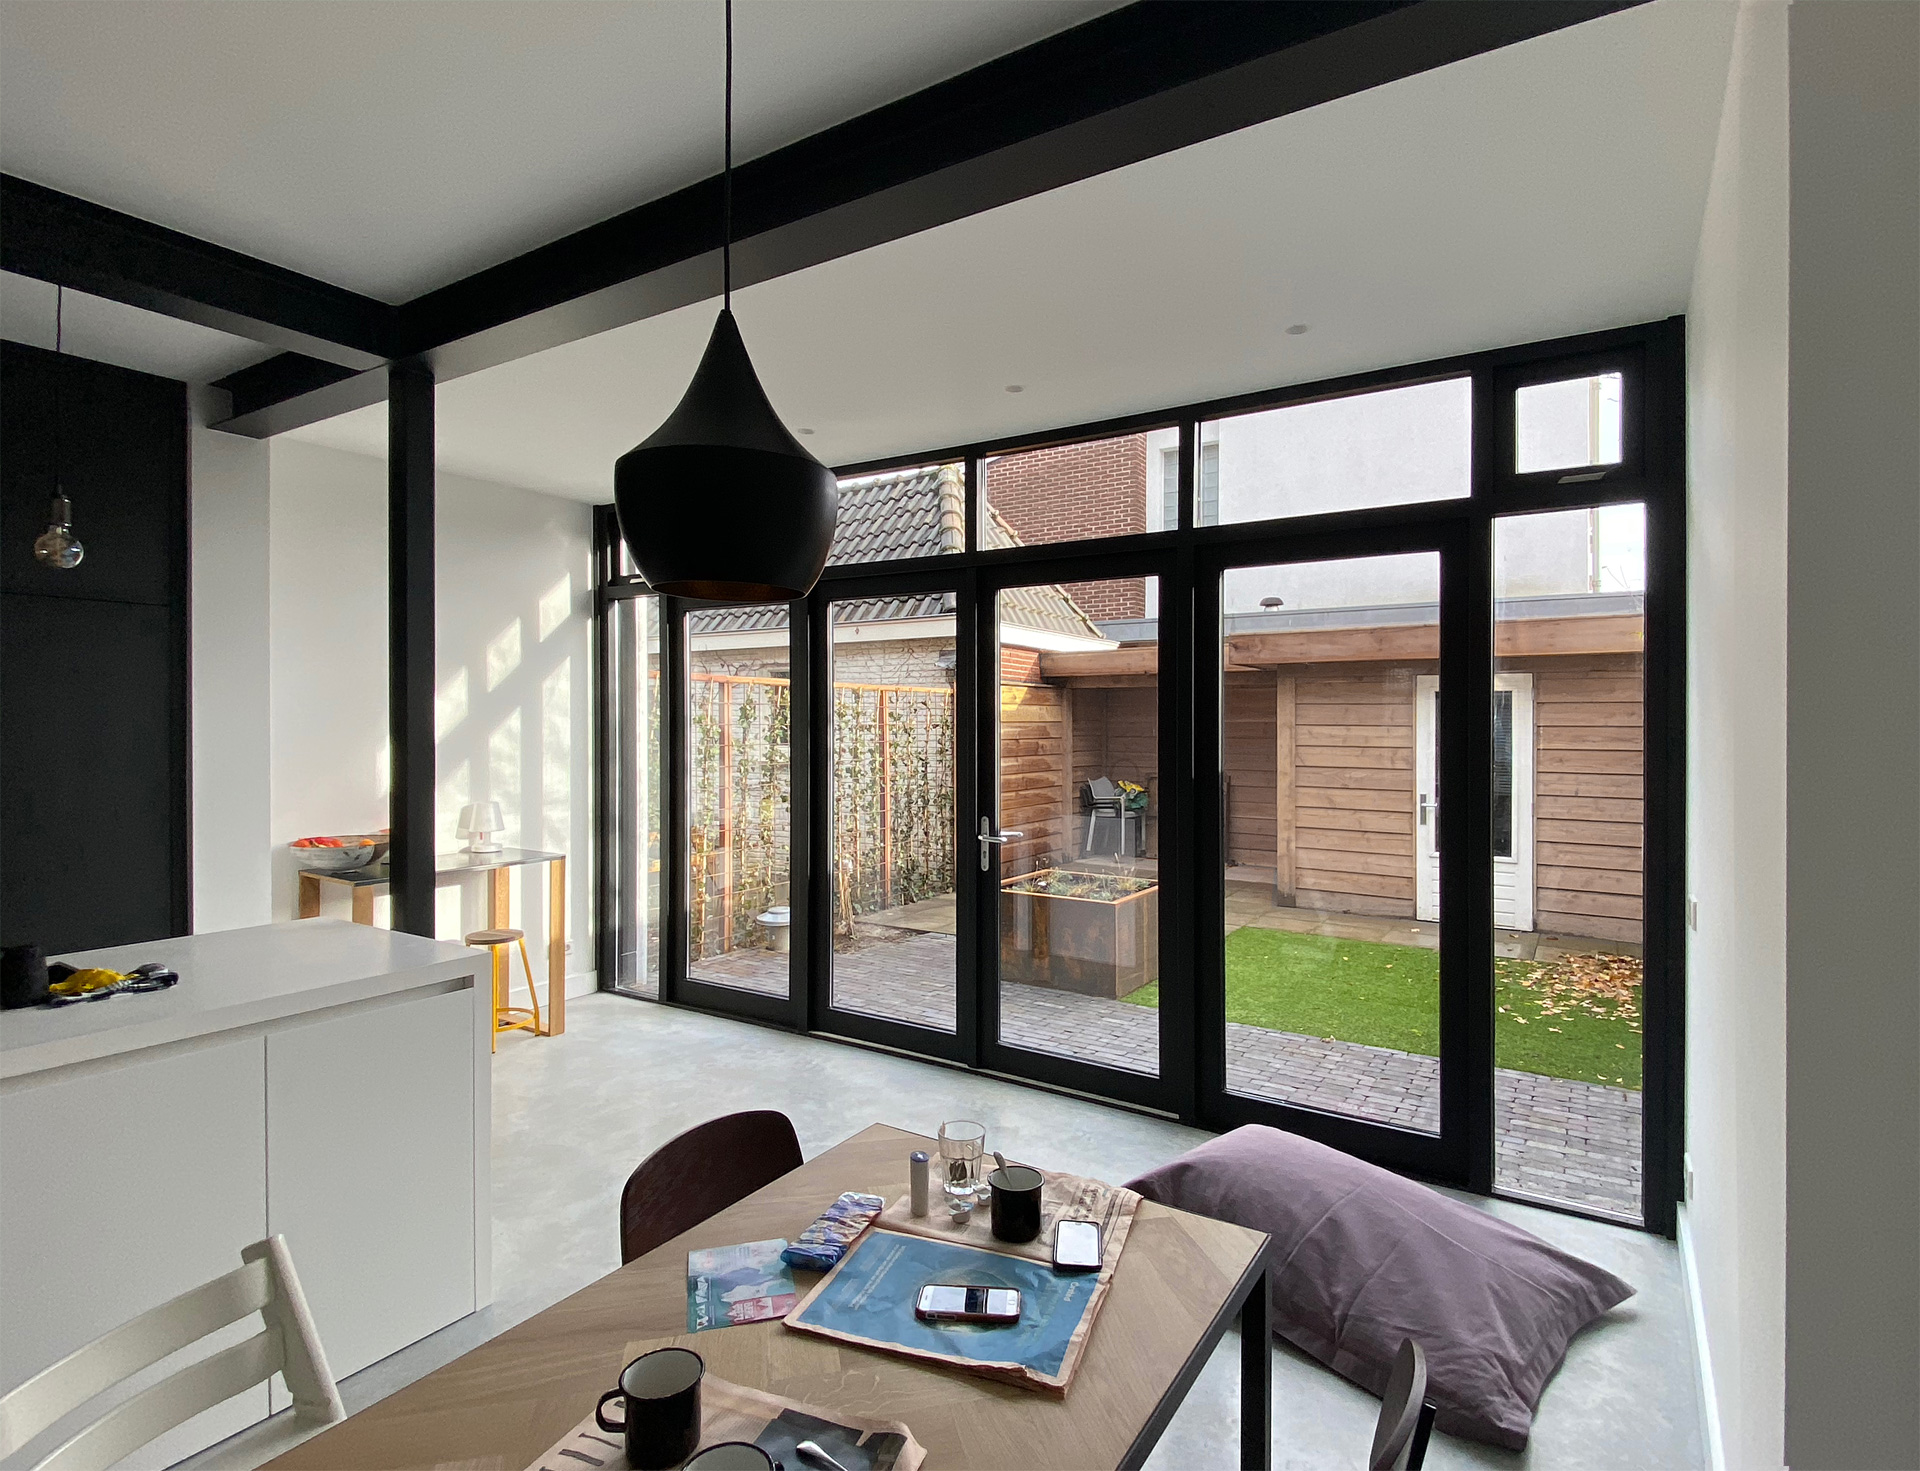 aanbouw-stalen-balken-zwart-ID-Architectuur-4